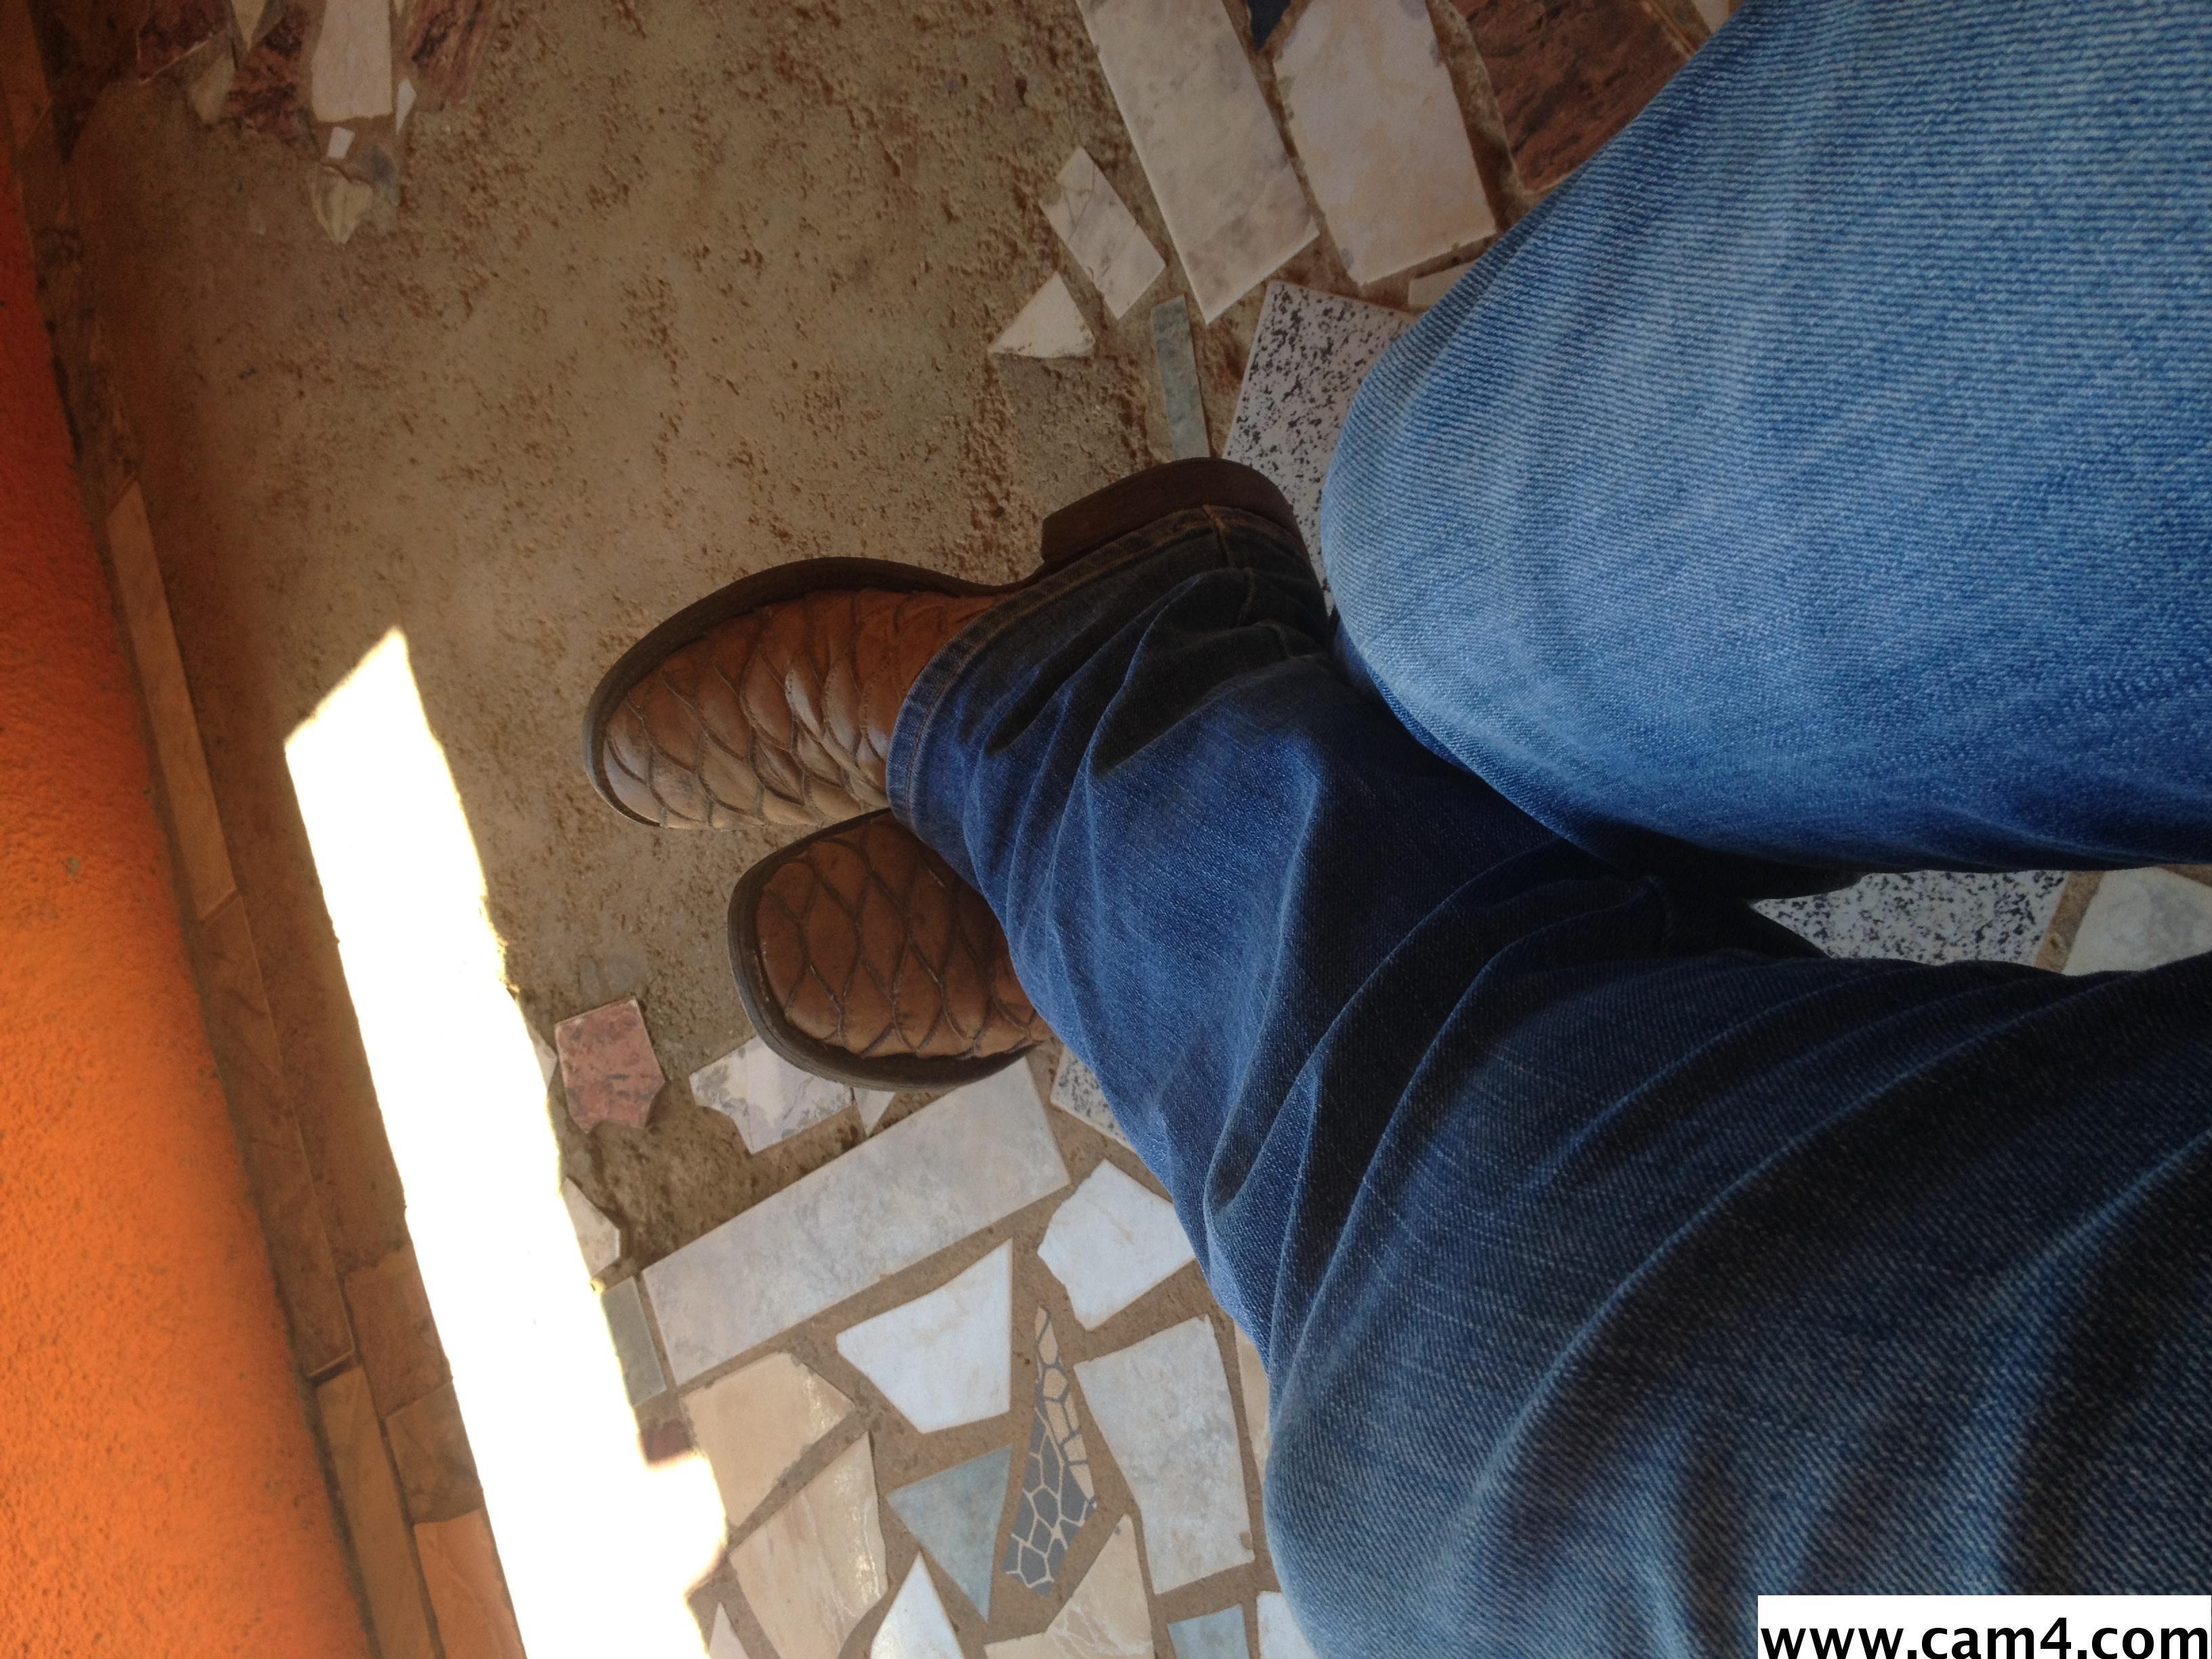 Cowboyroludo photo 10546125